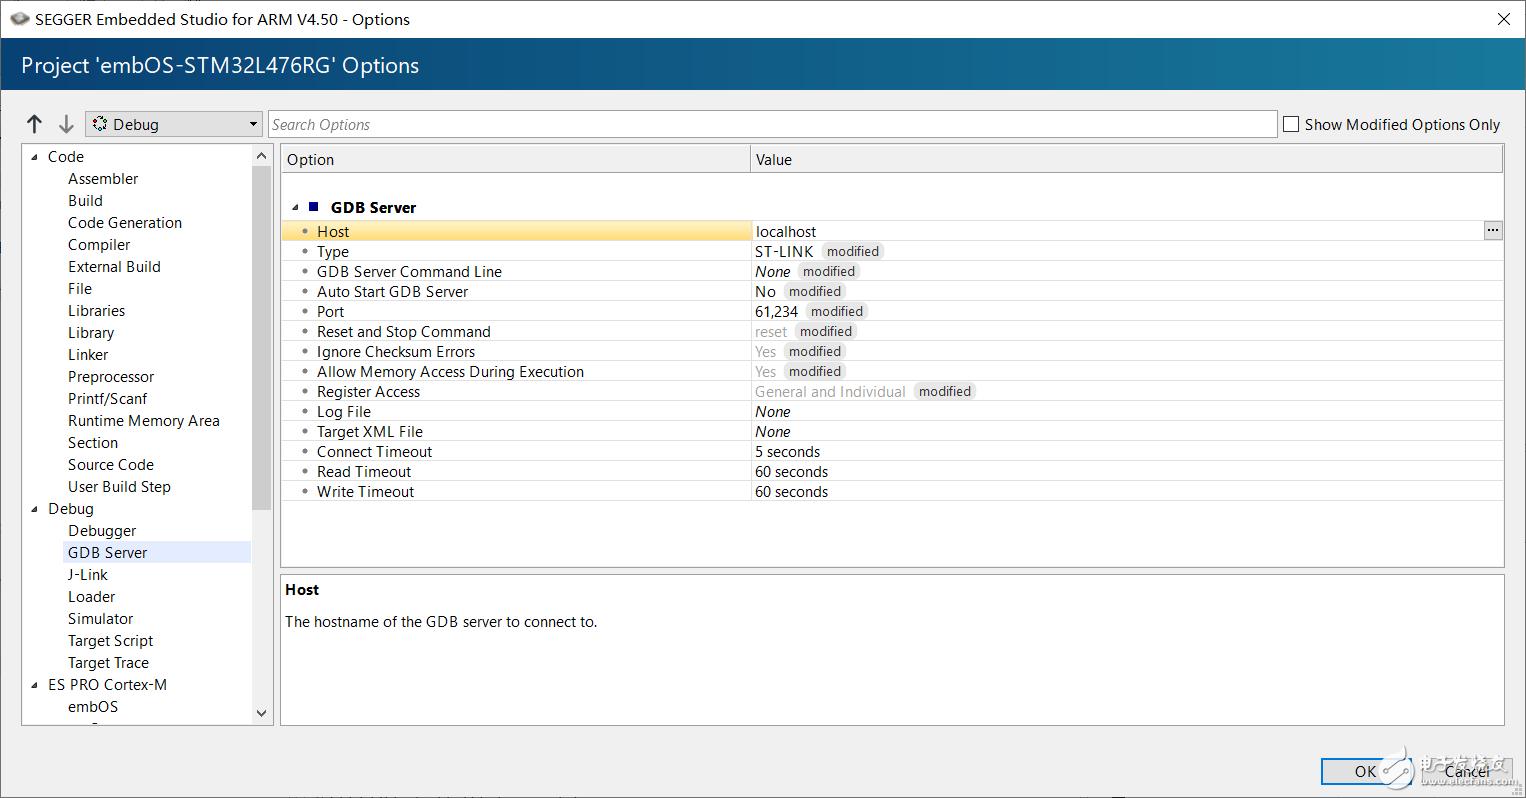 如何在Embedded Studio for ARM中使用ST-Link進行調試?